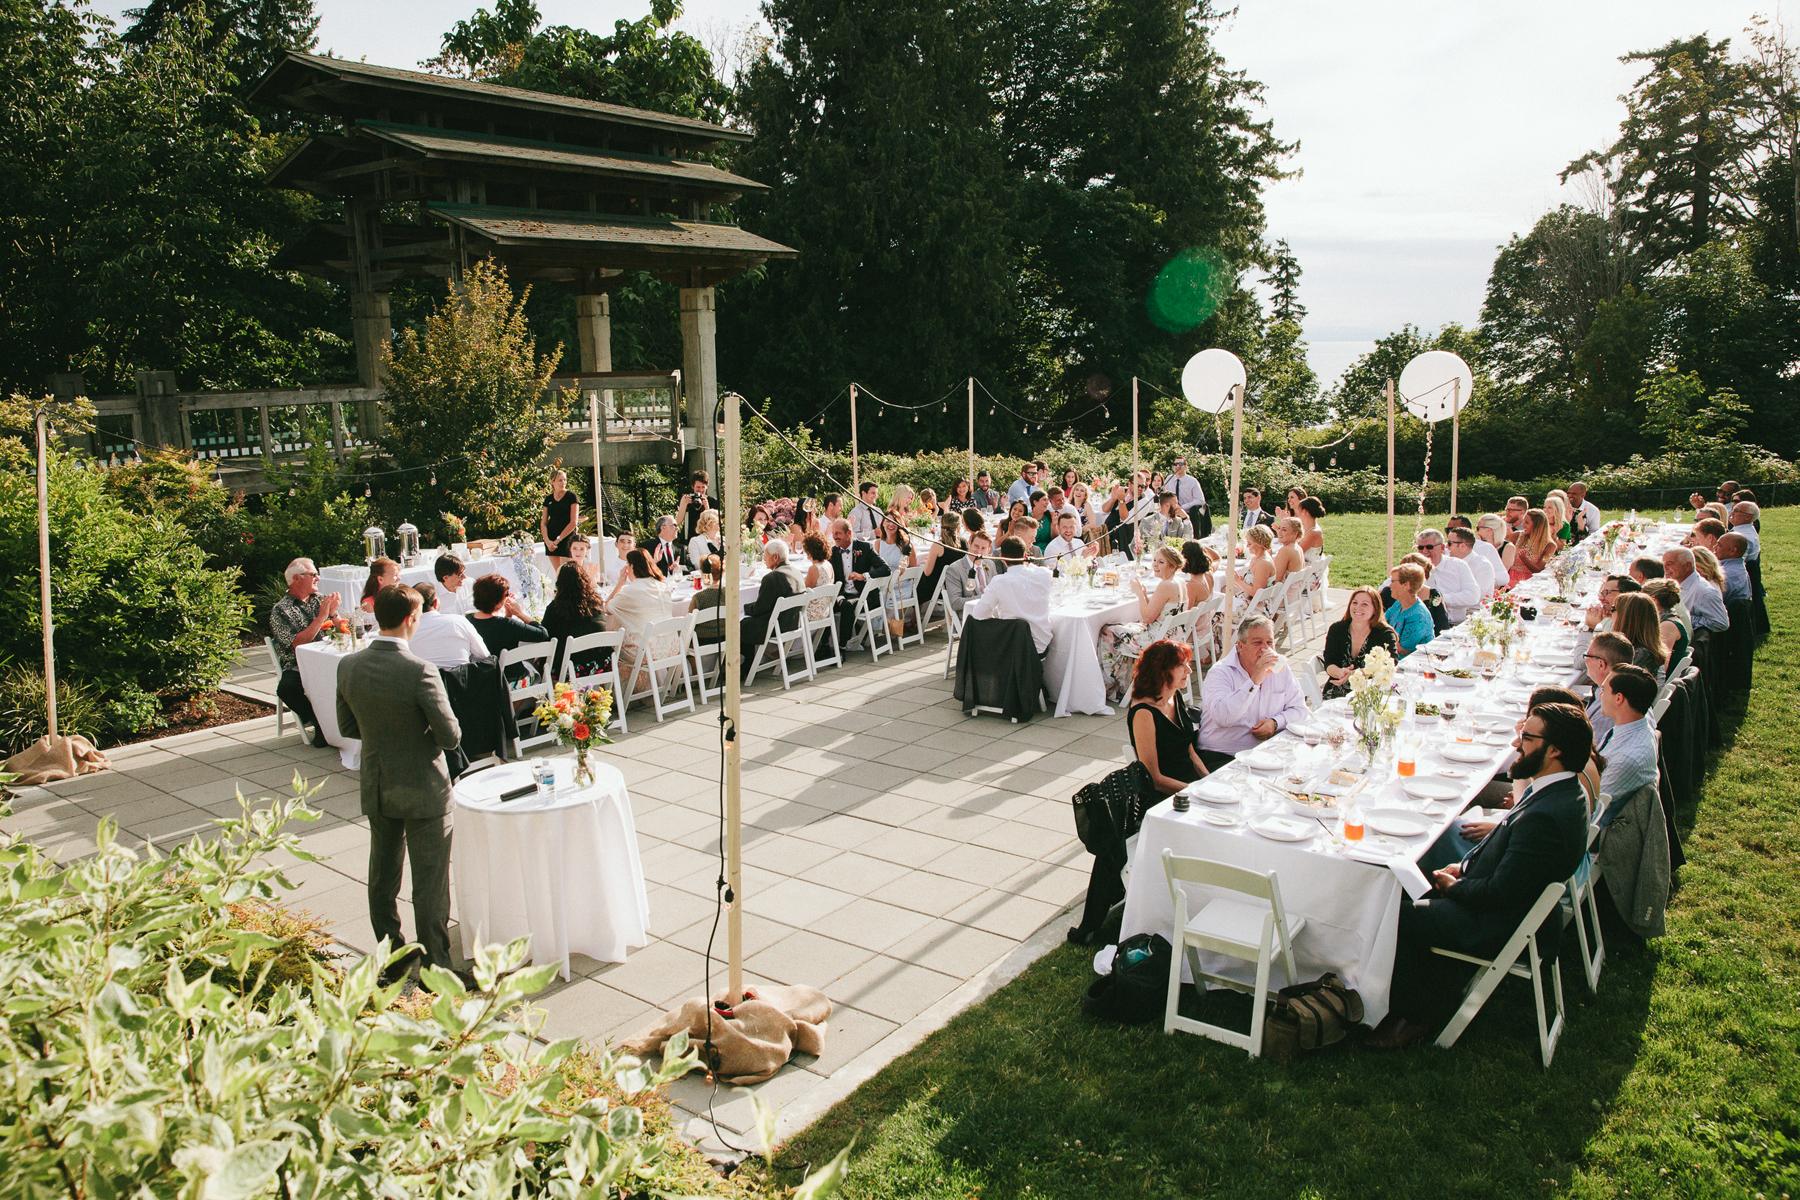 UBC-Botanical-Garden-Wedding-AD-085.jpg